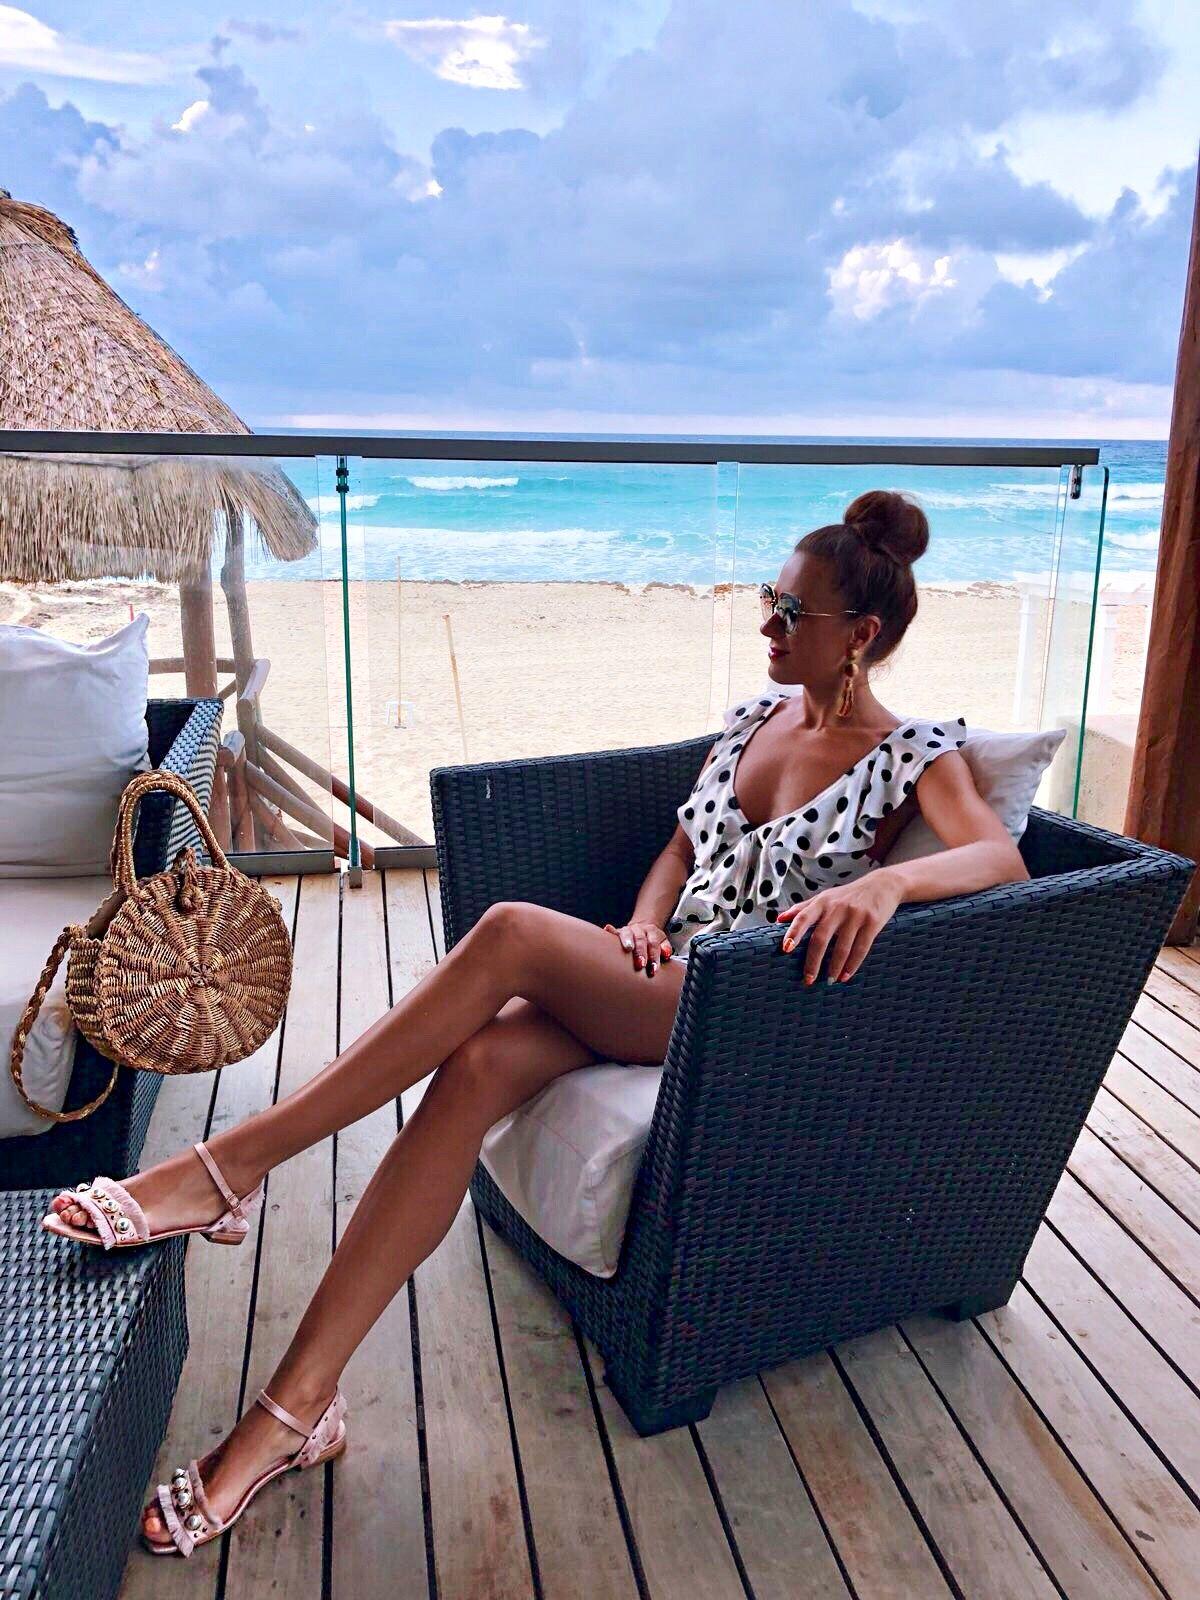 Elegant Duchess Fashion ASOS DESIGN Cut Out Ruffle Playsuit In Spot | Miu Miu sunglasses | South Beach Round Gold Woven Straw Cross Body Bag | Glamourous Pearl Sandals | ASOS DESIGN Wrapped Bead & Tassel Earrings